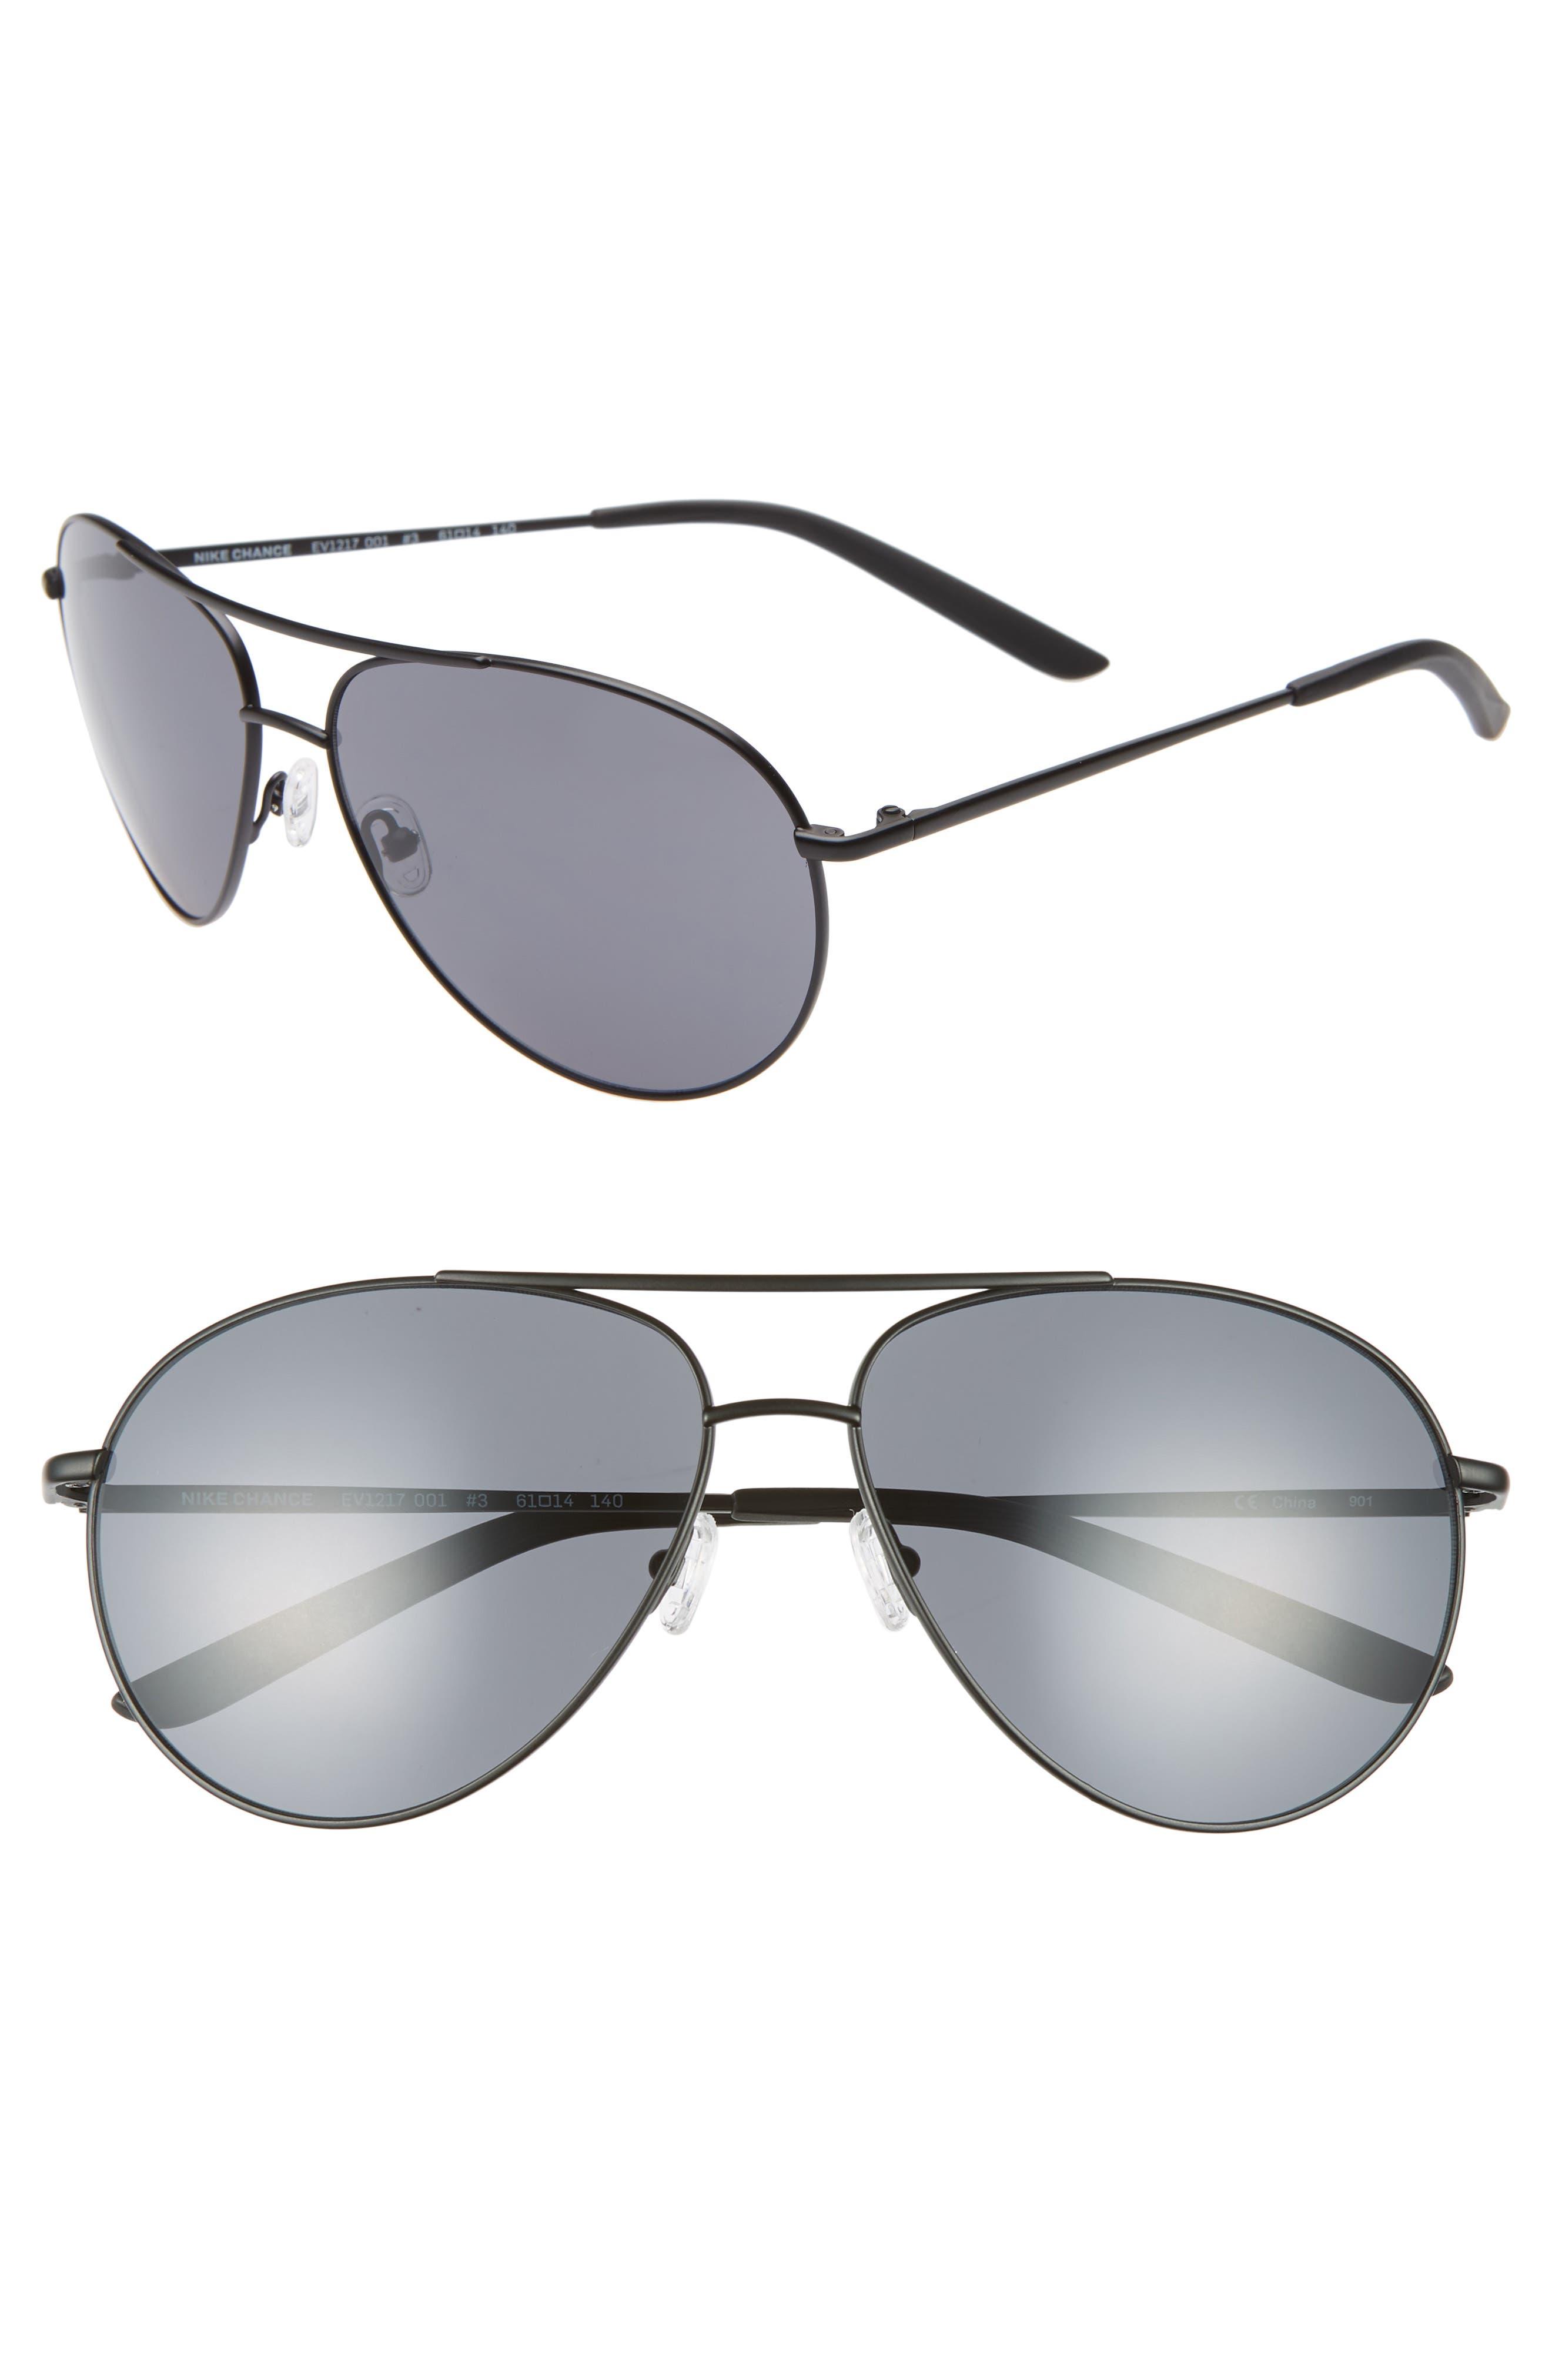 Nike Chance 61Mm Aviator Sunglasses - Satin Black/ Dark Grey